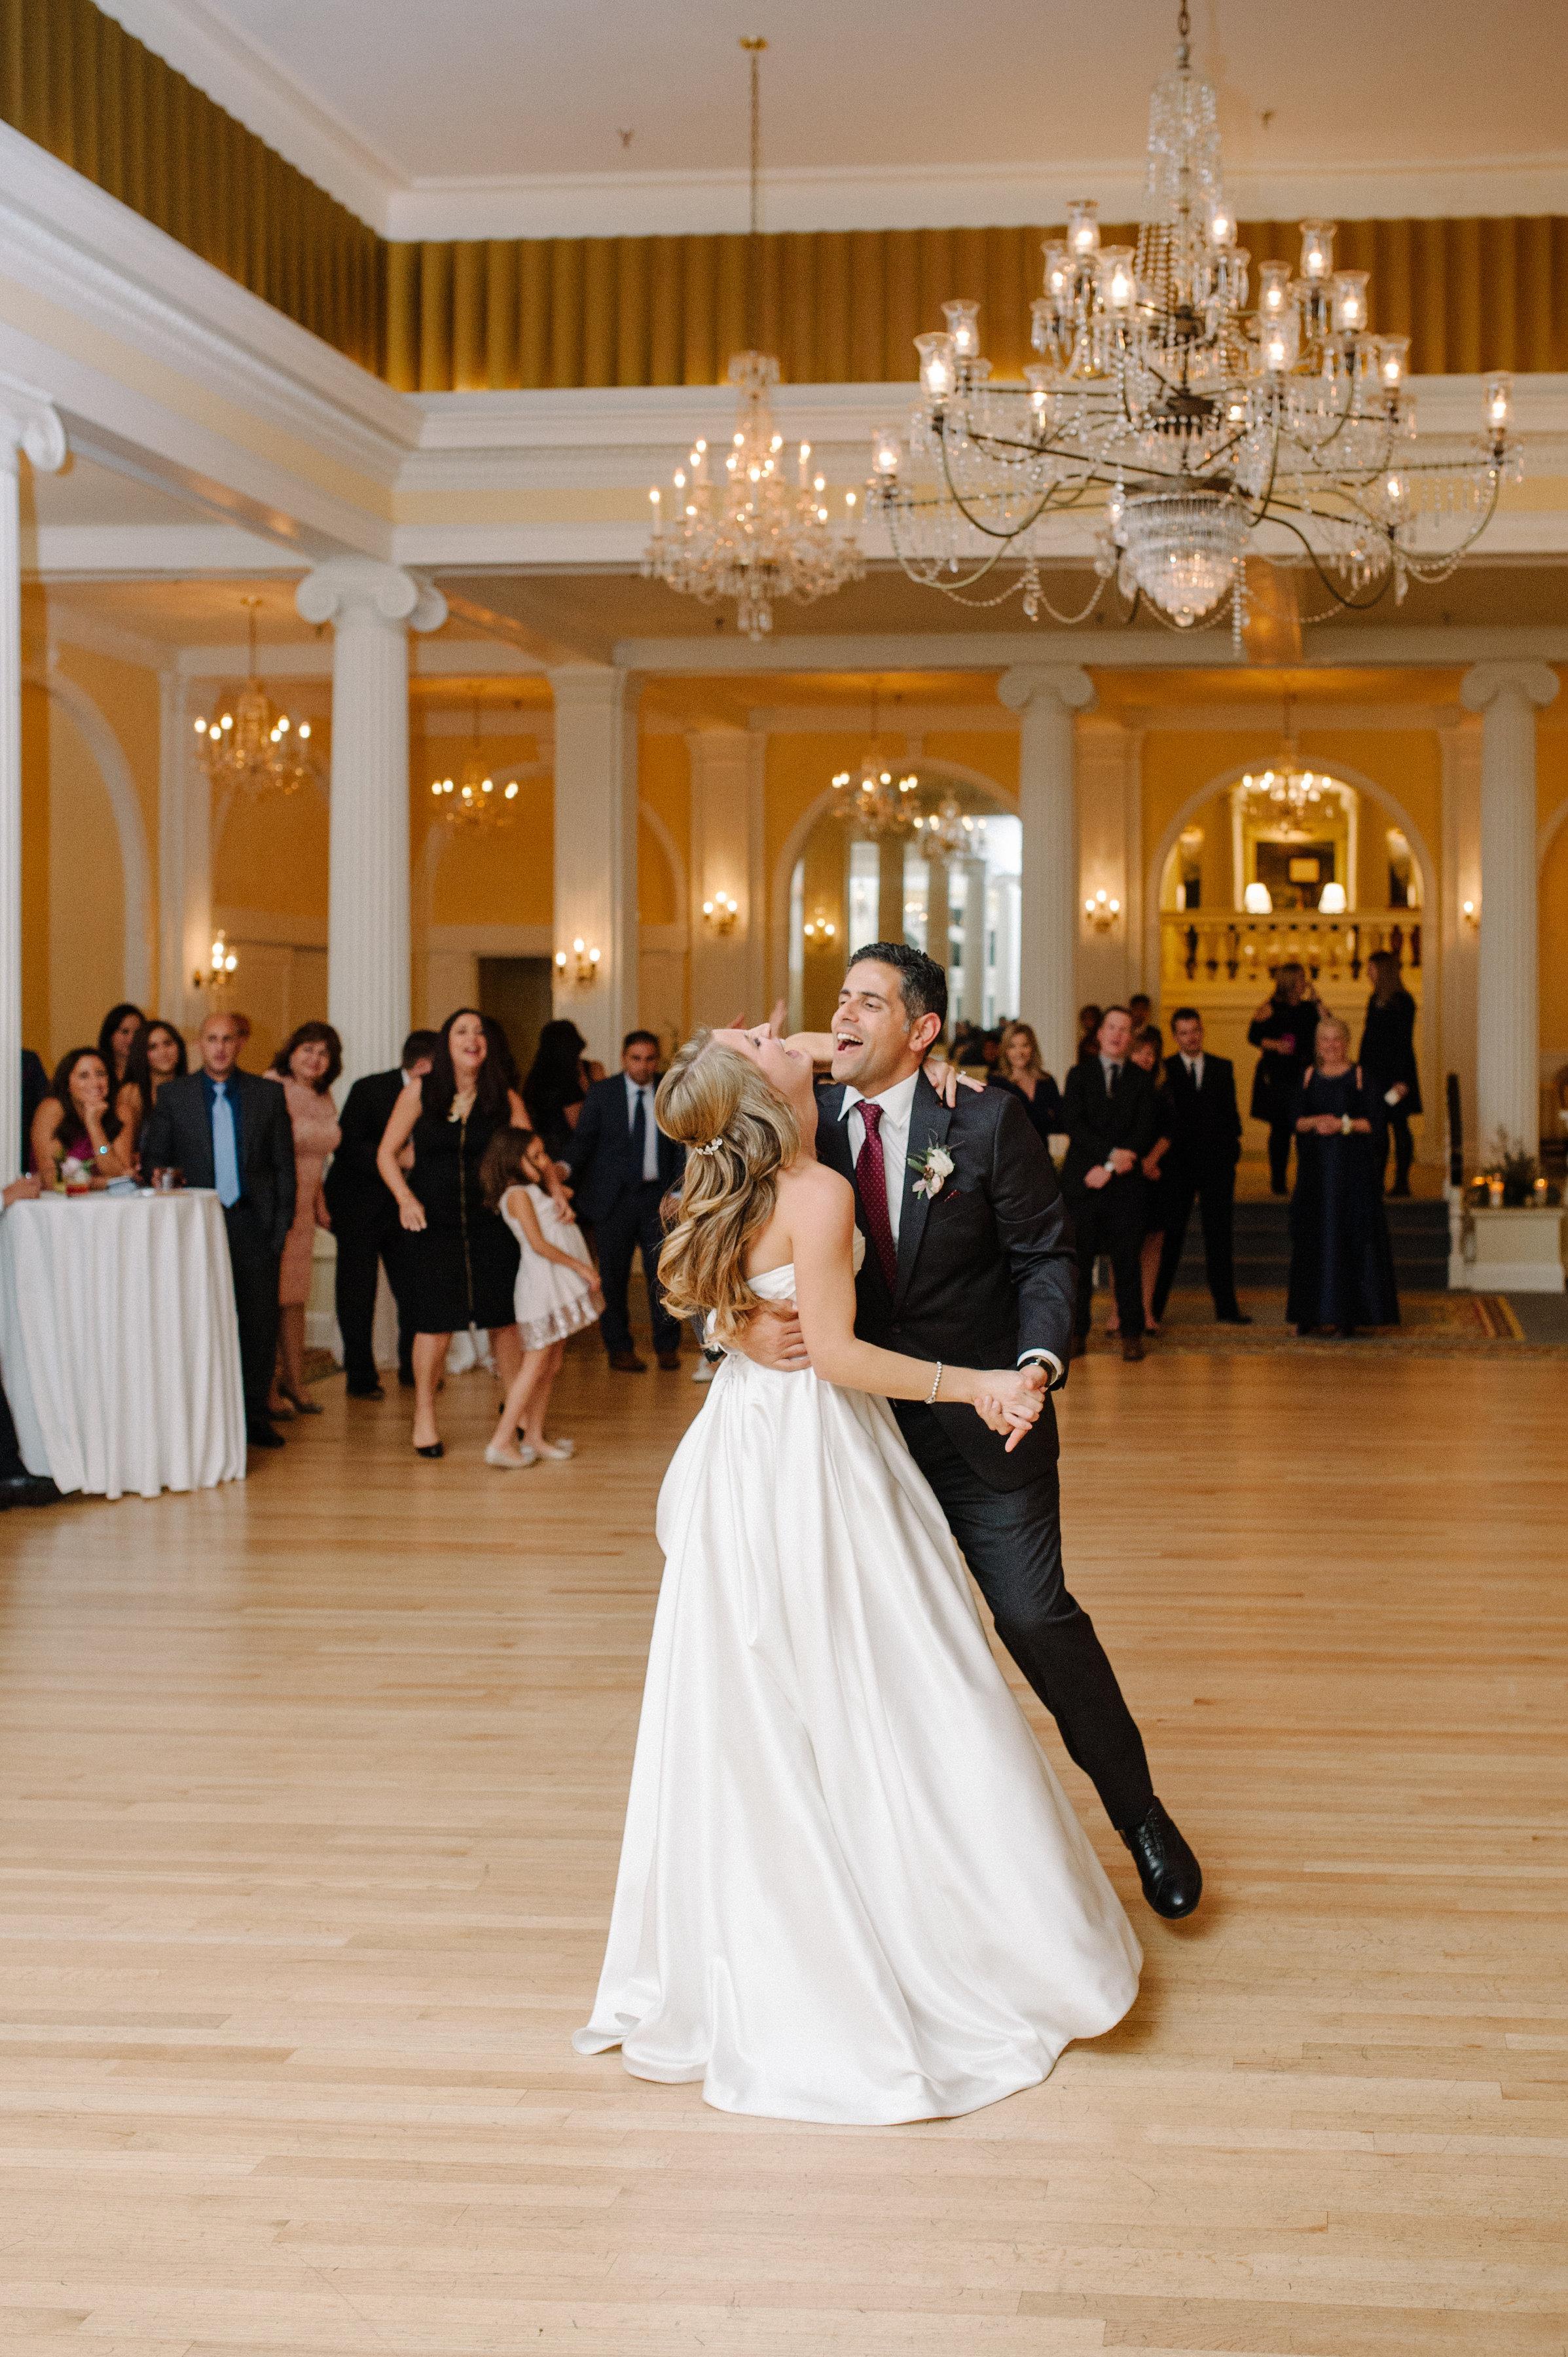 Boutros Wedding | The Omni Homestead Resorts, Hot Springs |  Sera Petras Photography